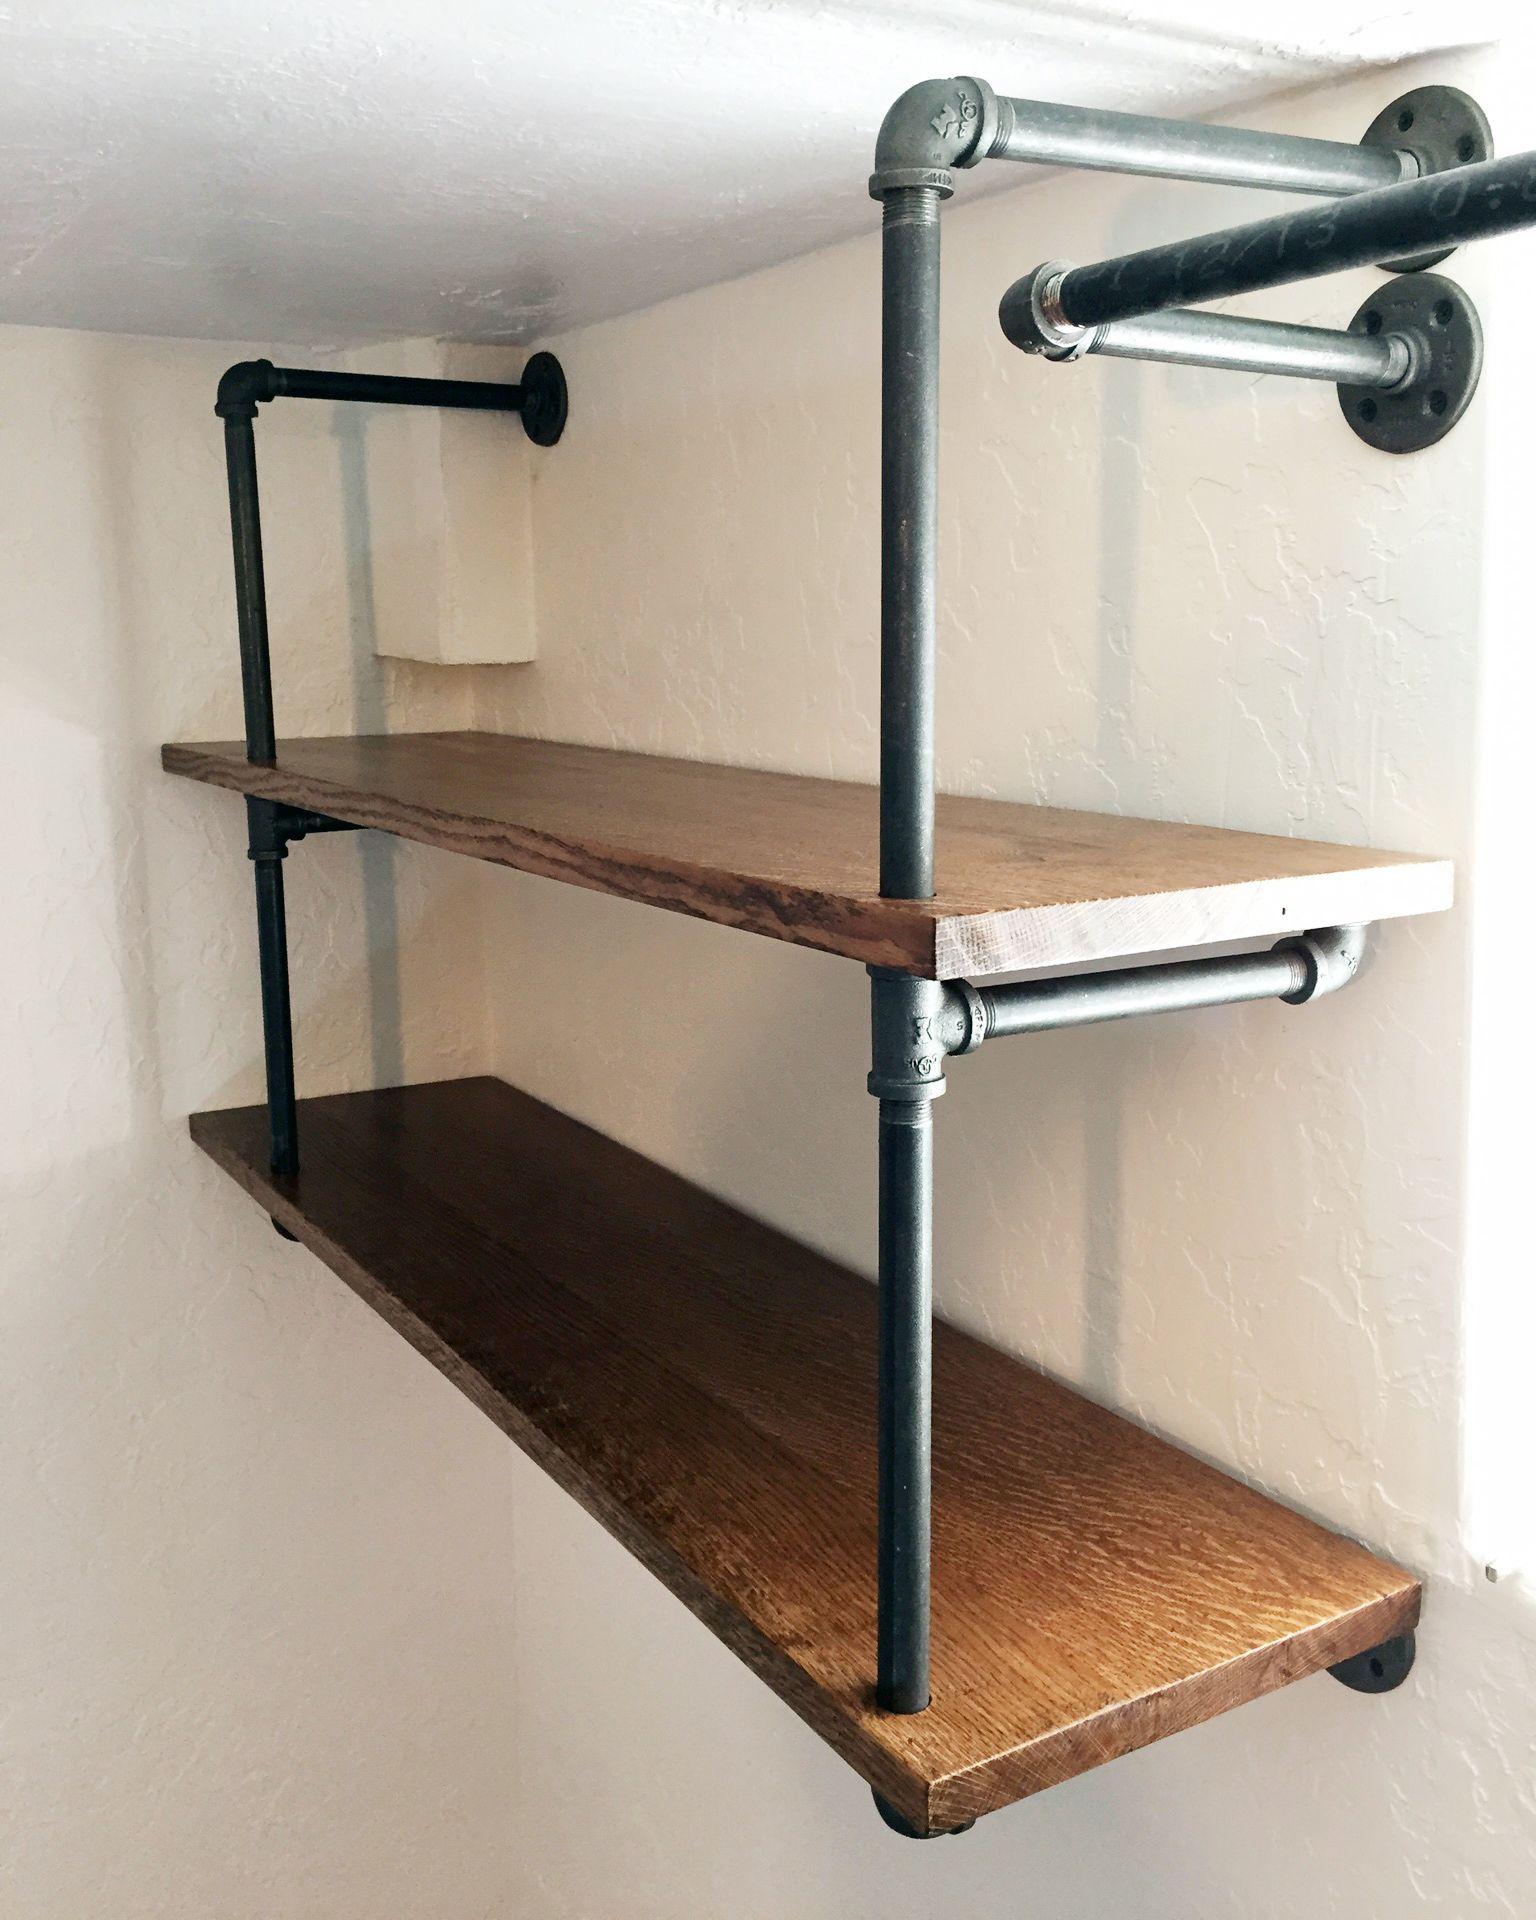 diy industrial pipe shelving tuyau tablette et appartements. Black Bedroom Furniture Sets. Home Design Ideas